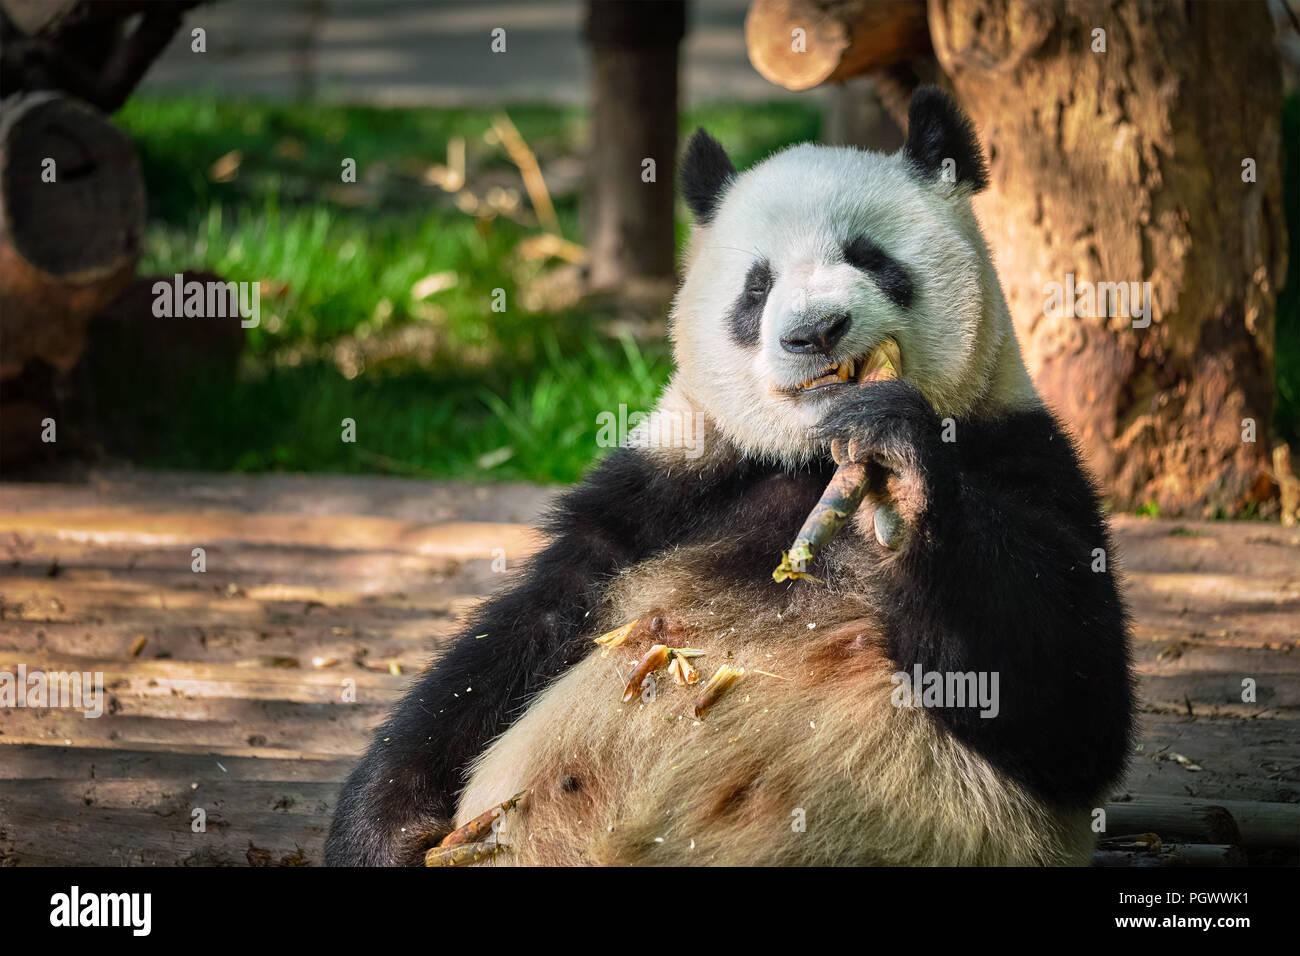 Gigantesco orso panda in Cina Immagini Stock